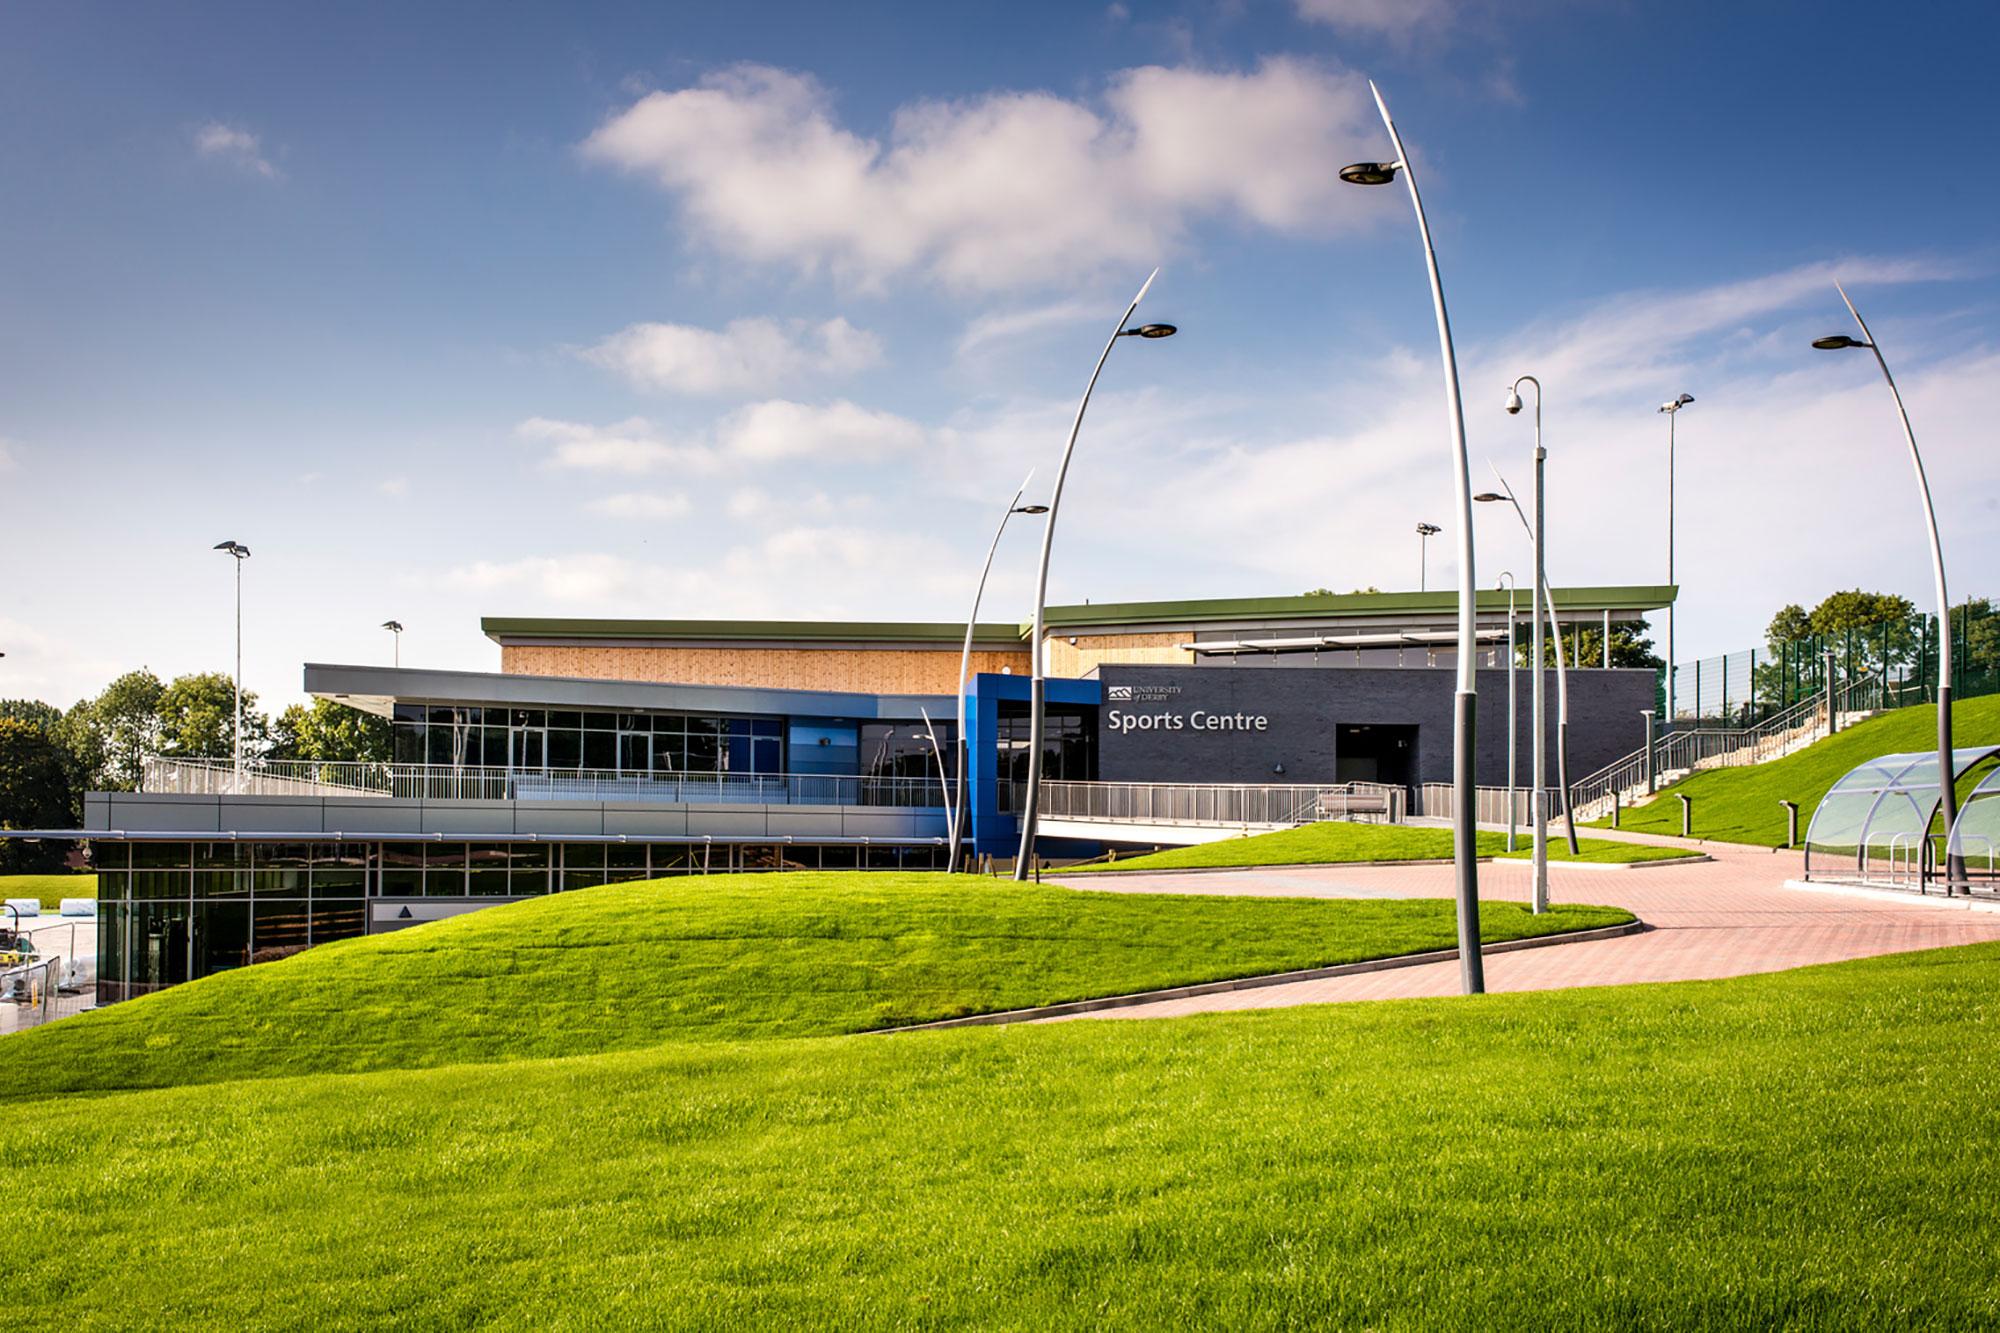 Sports Centre, University of Derby